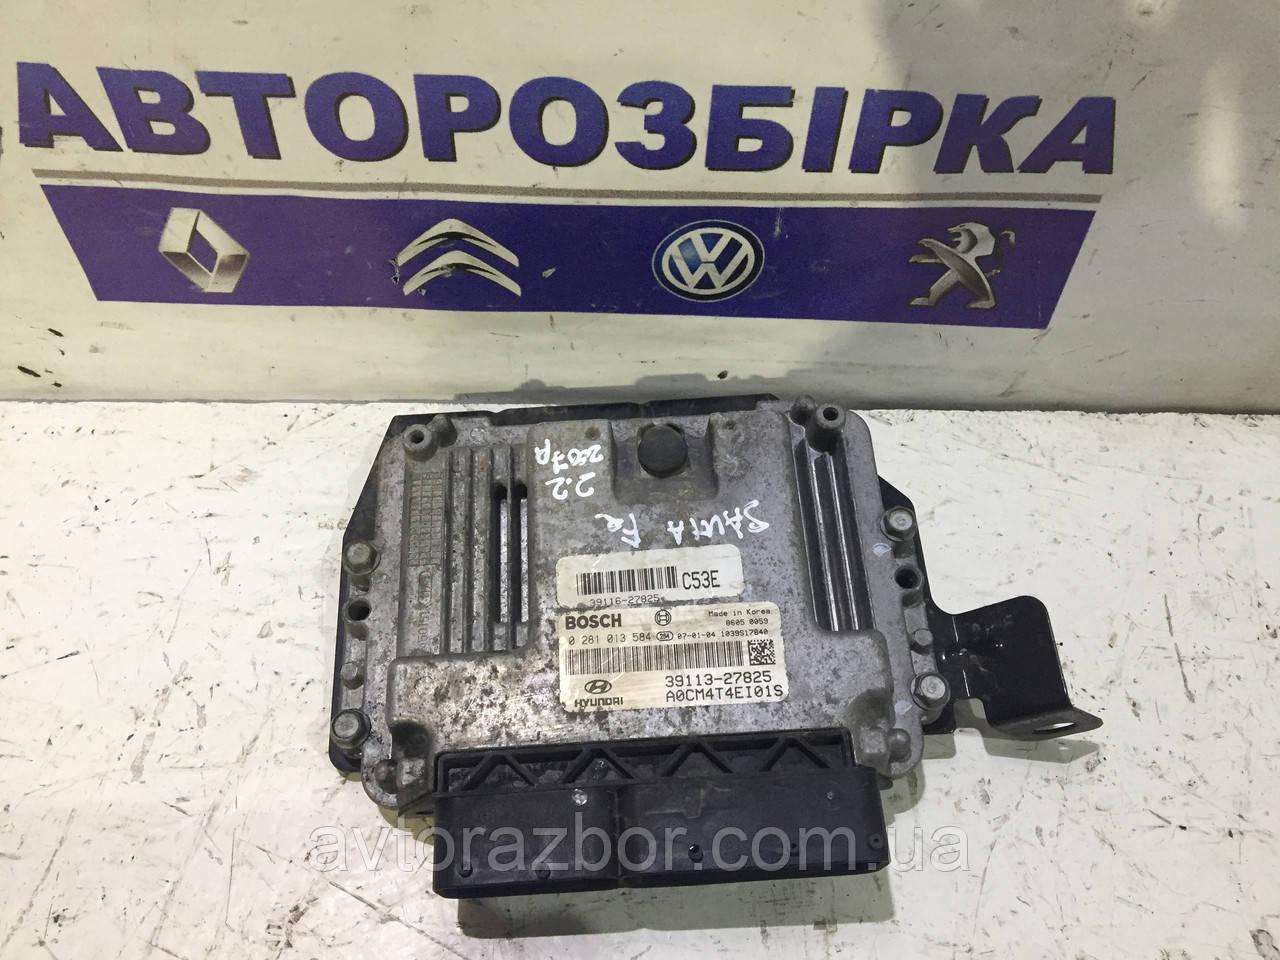 Блок управления двигателемуправління мотором hyundai santa fe 2006 2007 2008 2009 2010 хюндай санта фе 2.2